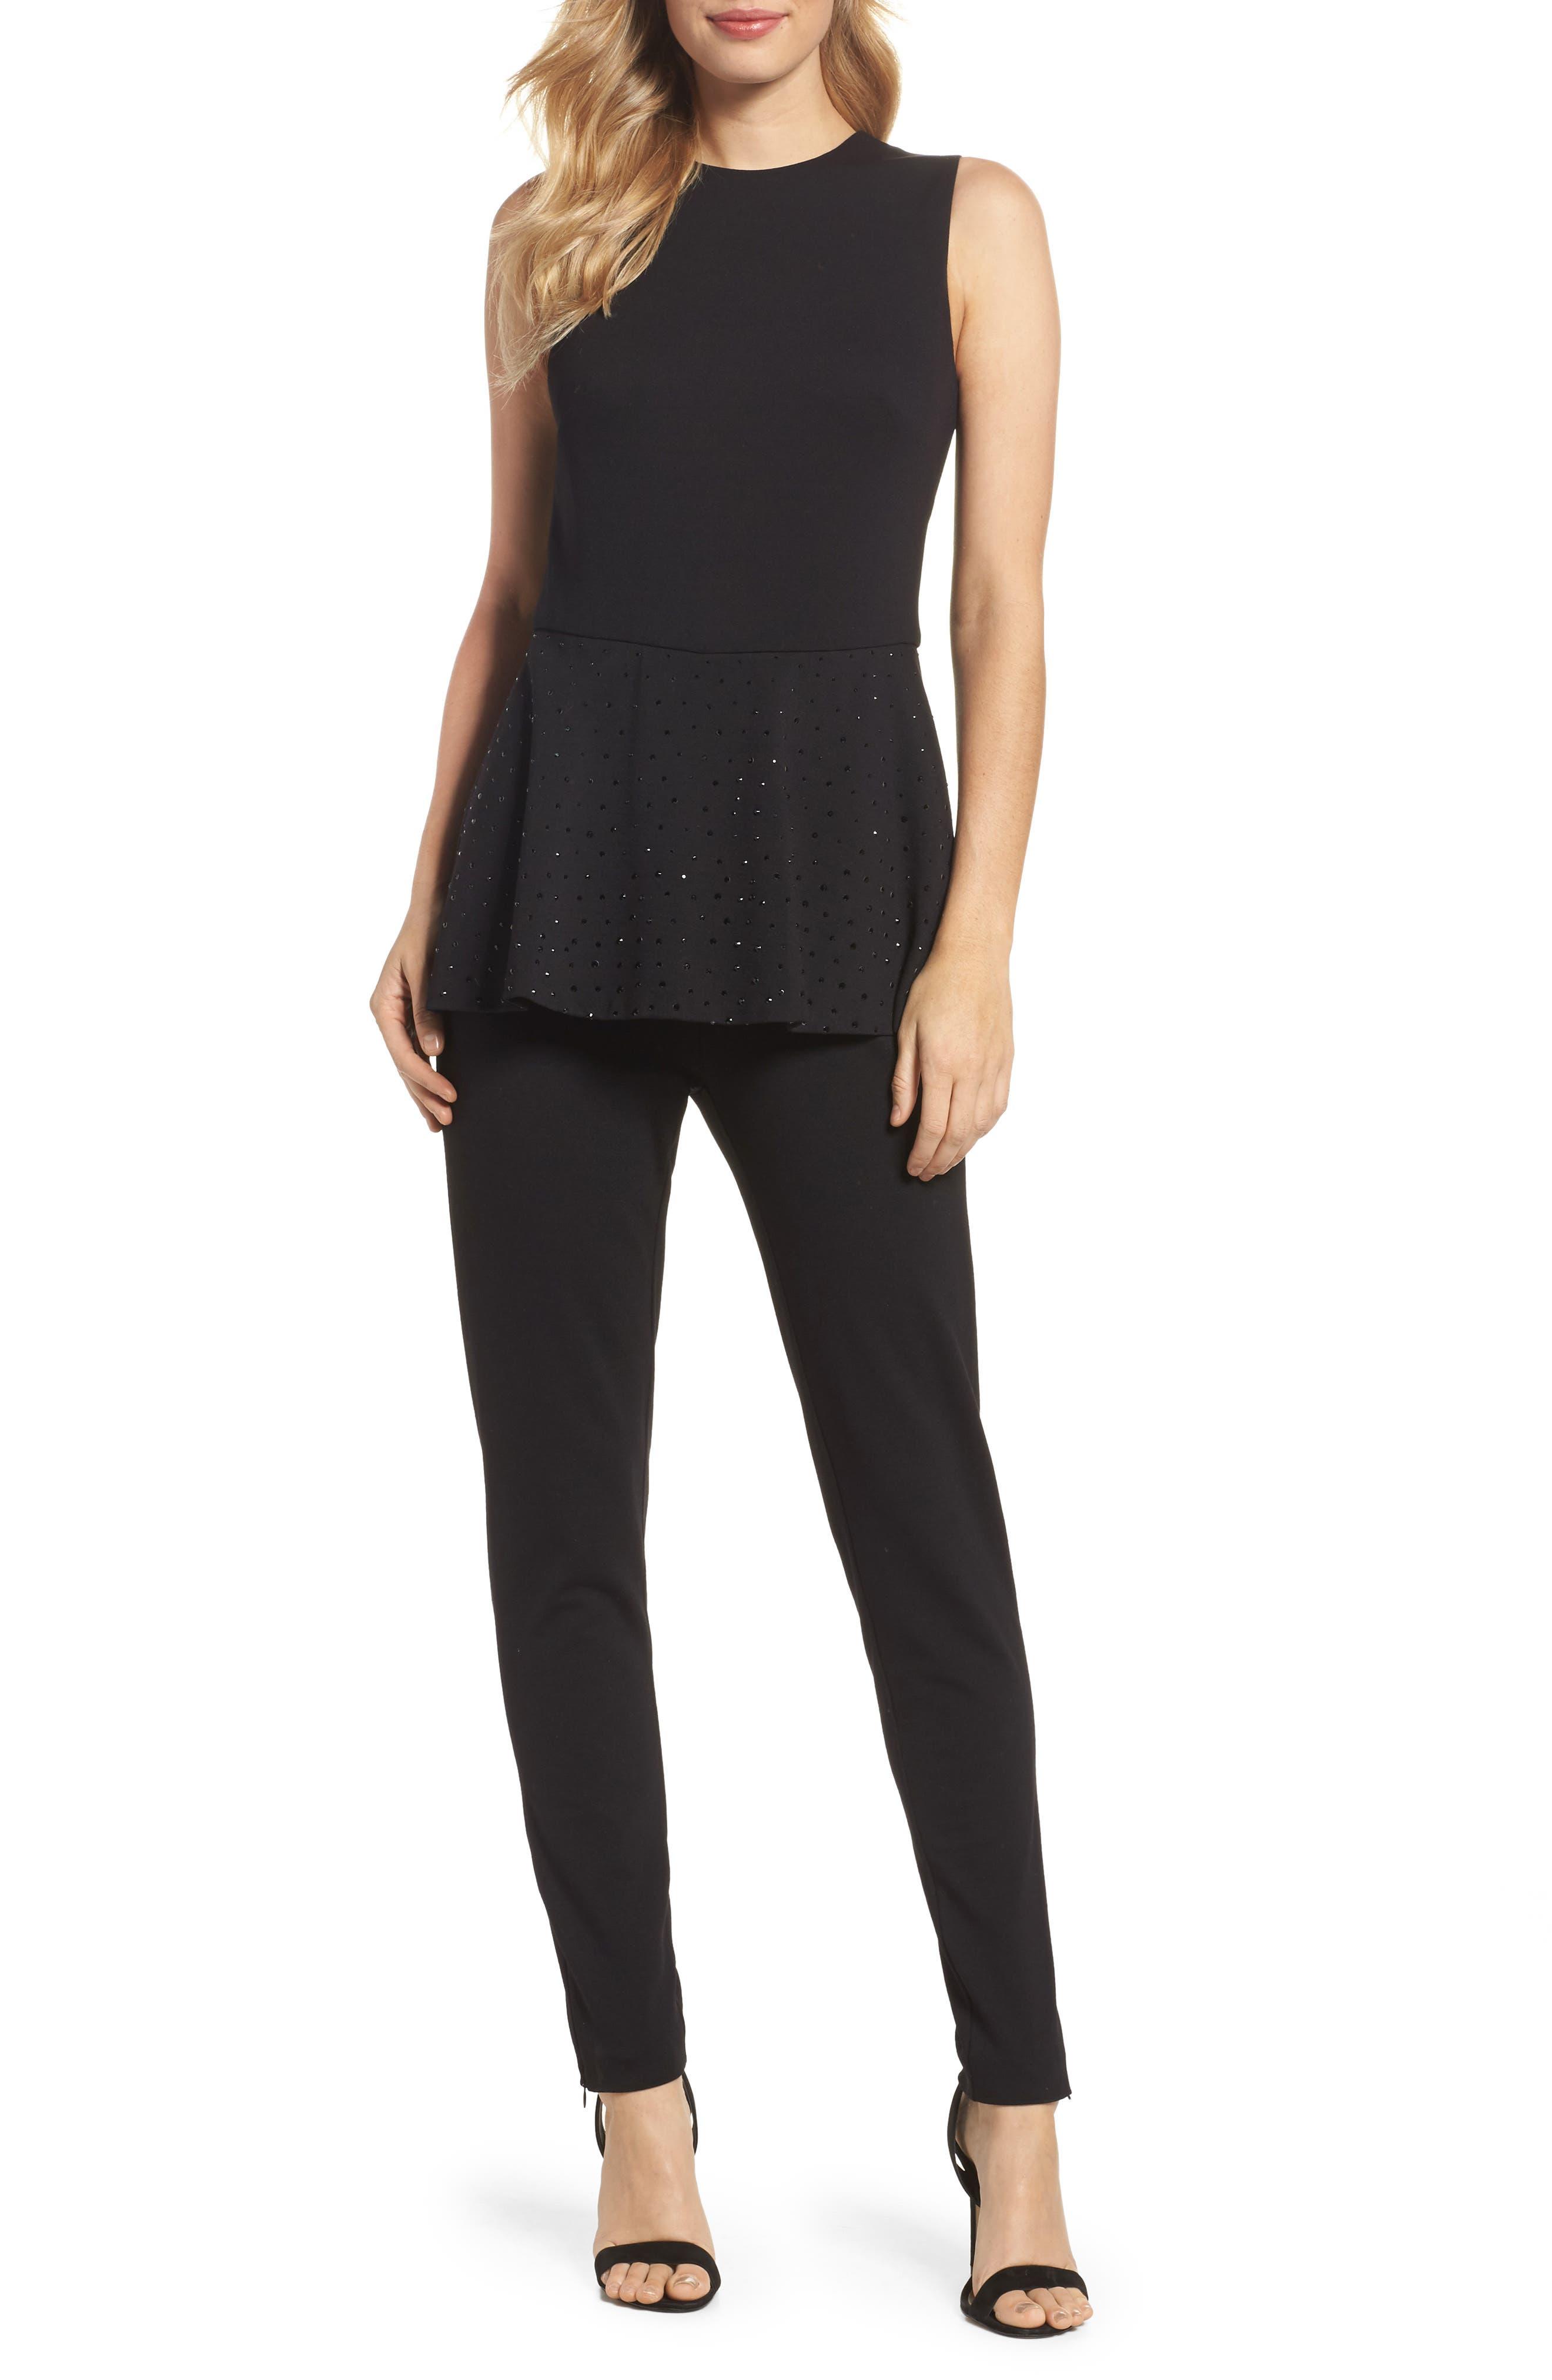 Alternate Image 1 Selected - Eliza J Peplum Jumpsuit (Regular & Petite)